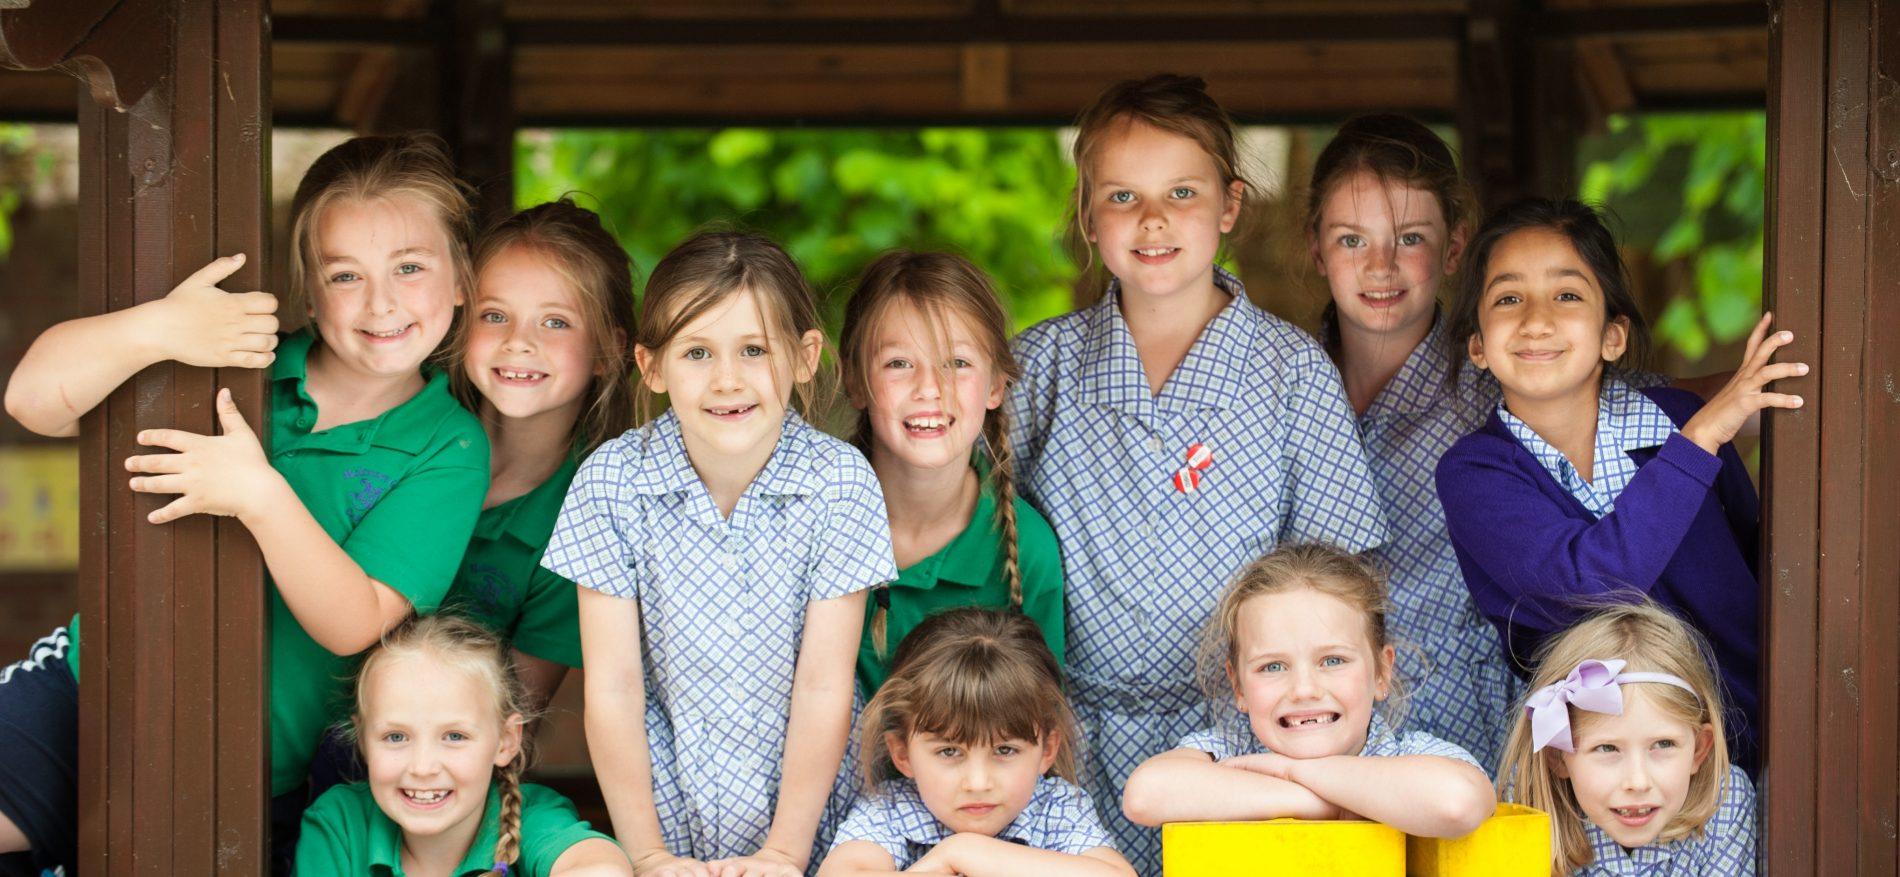 school girls maltmans green